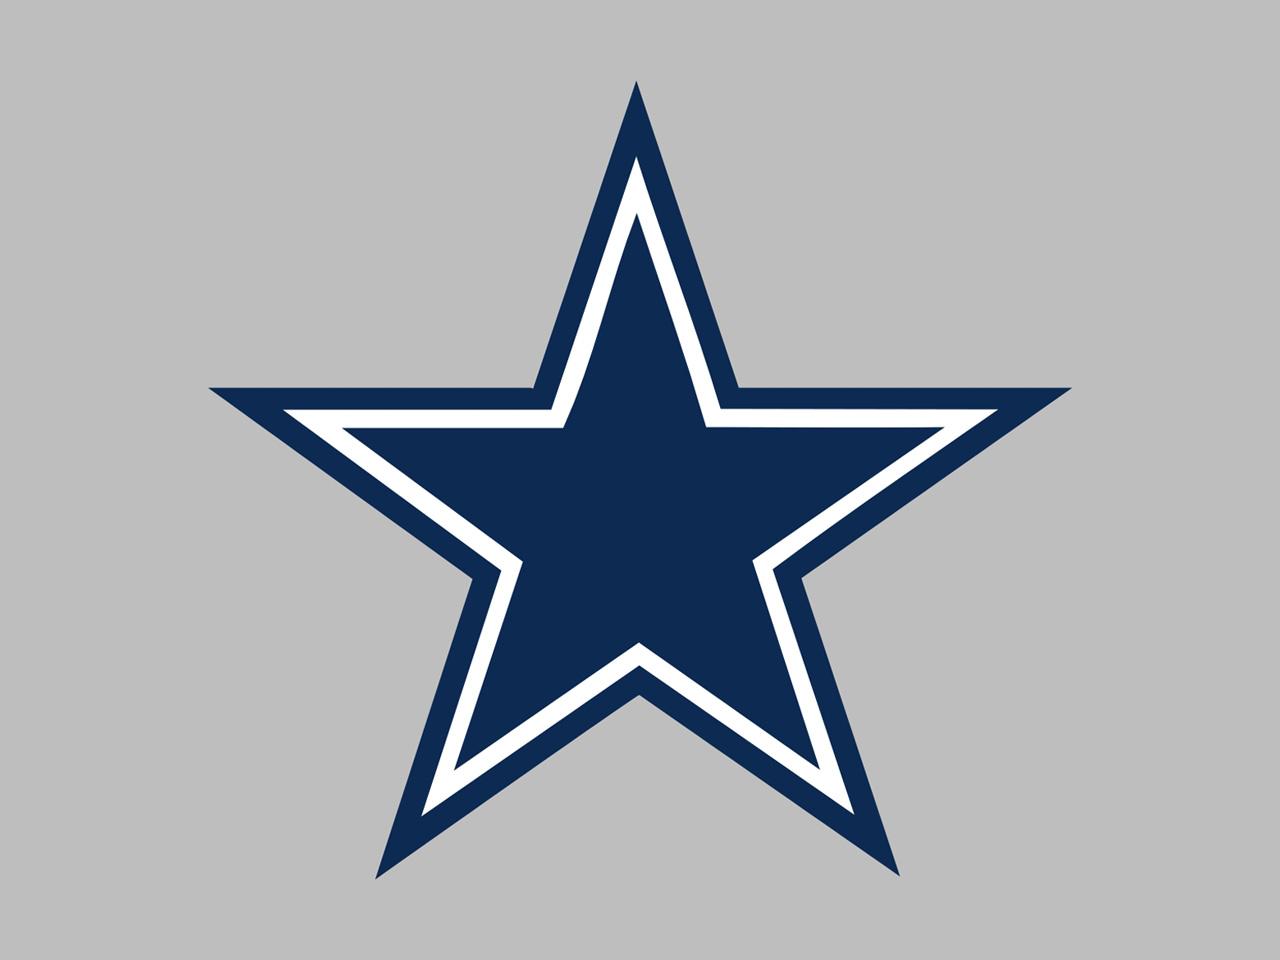 dallas cowboys star logos rh logolynx com dallas cowboys logo vector download dallas cowboys star logo vector